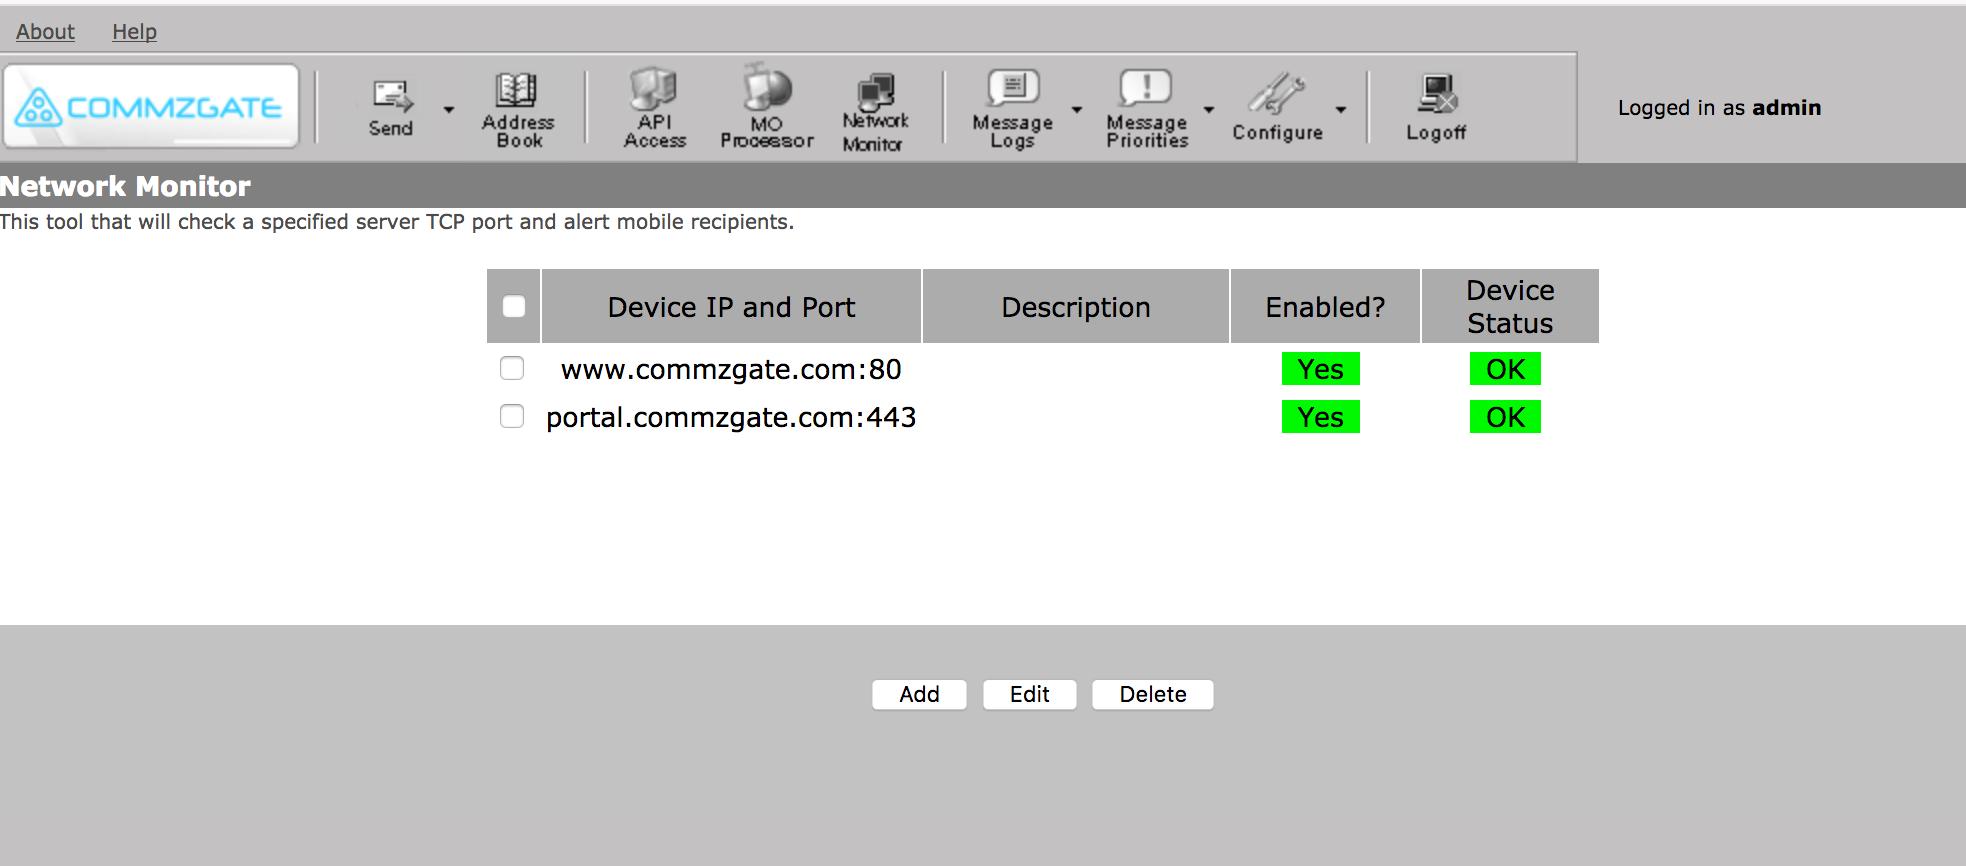 CommzGate Enterprise SMS gateway hardware appliance, On